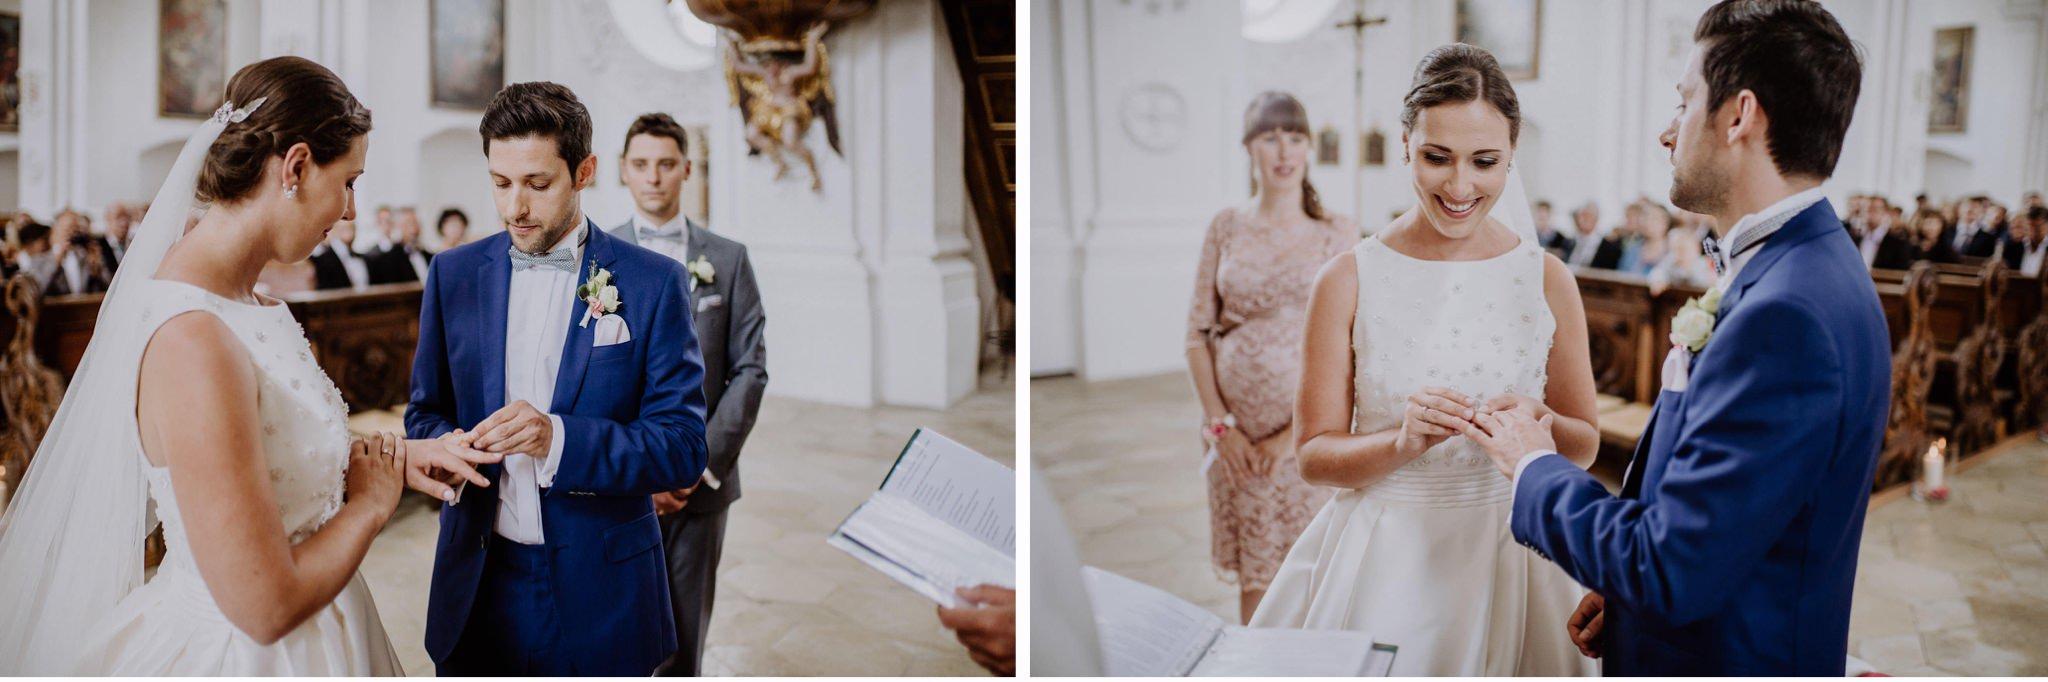 wedding photographer hamilton new zealand 1037 2